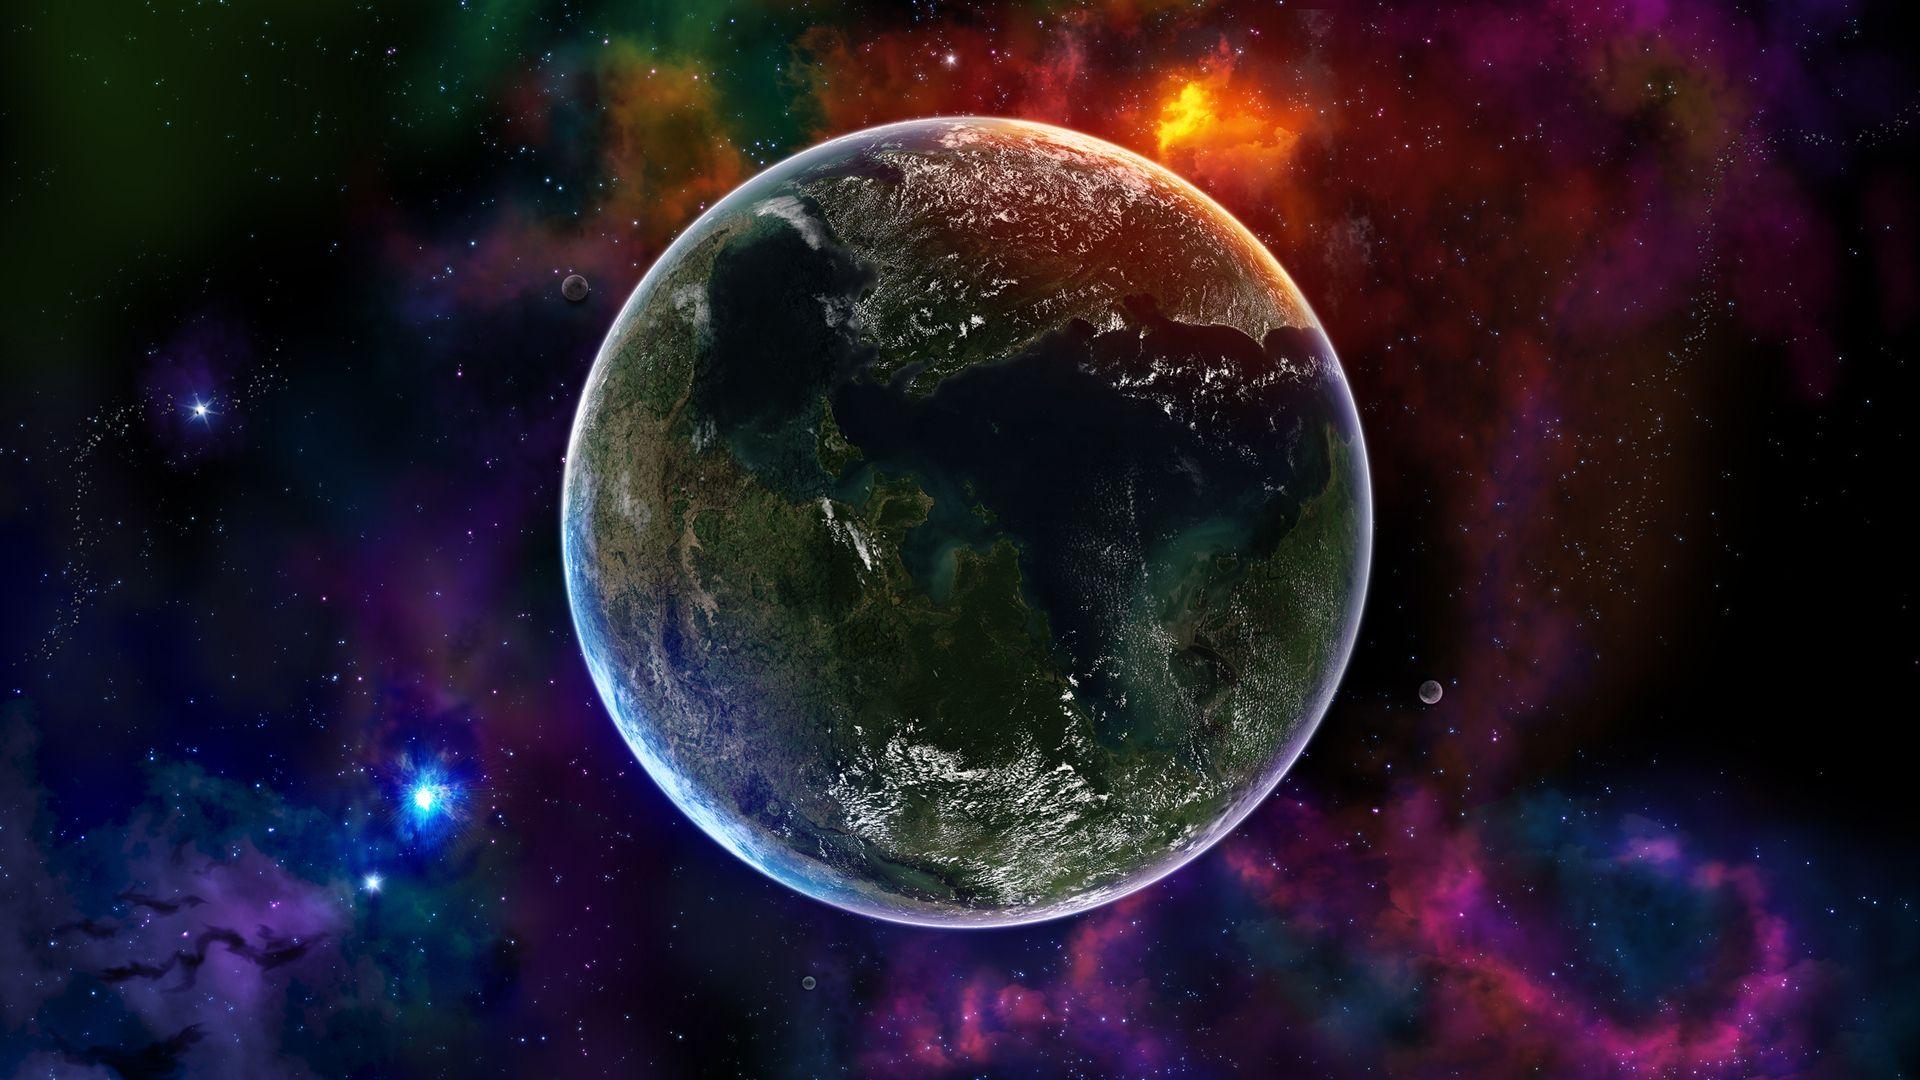 Fond D Ecran Hd Espace Planete Fond Ecran Gratuit Fond